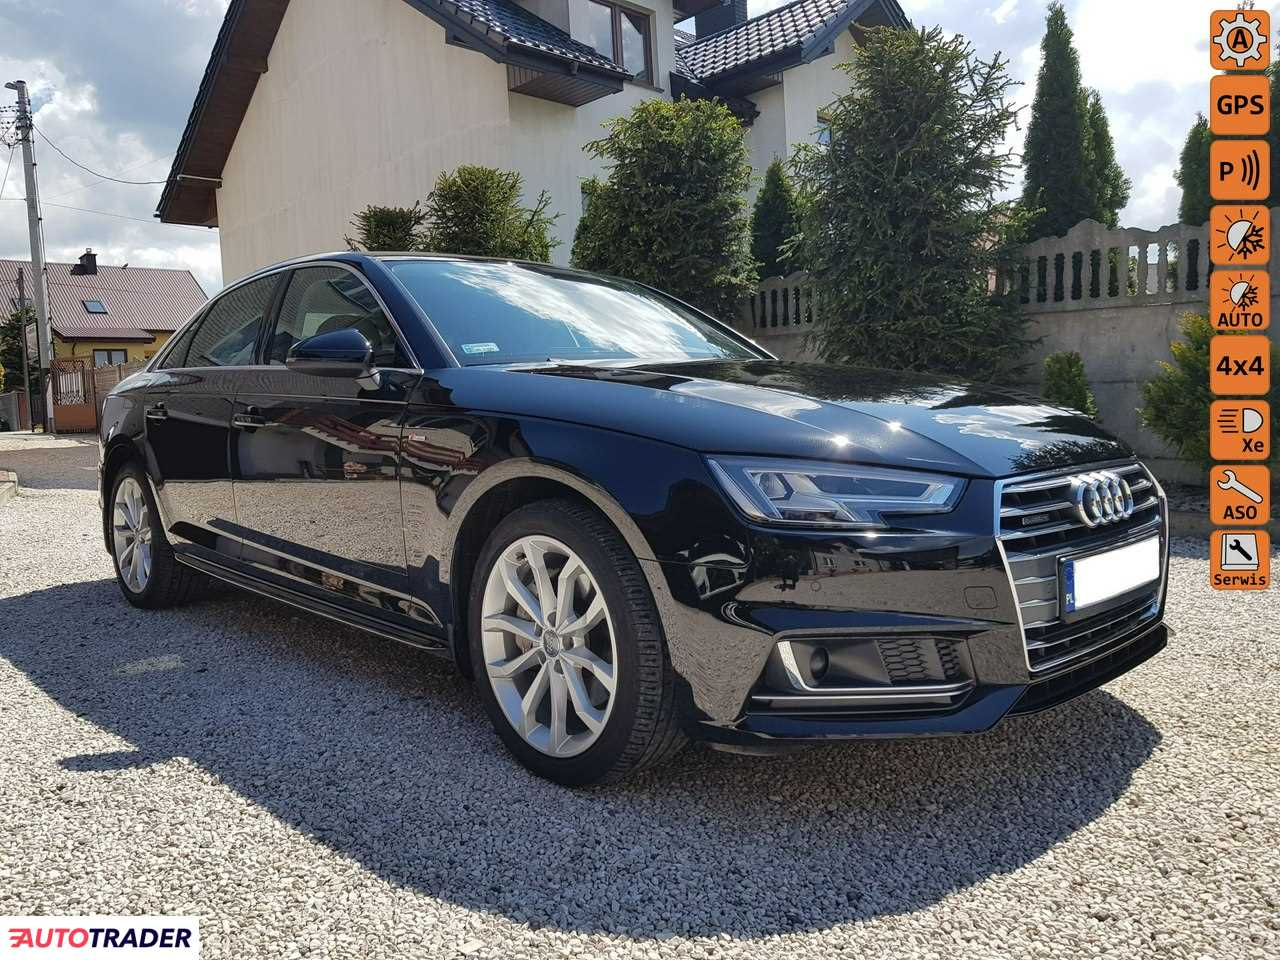 Audi A4 2017 2 190 KM